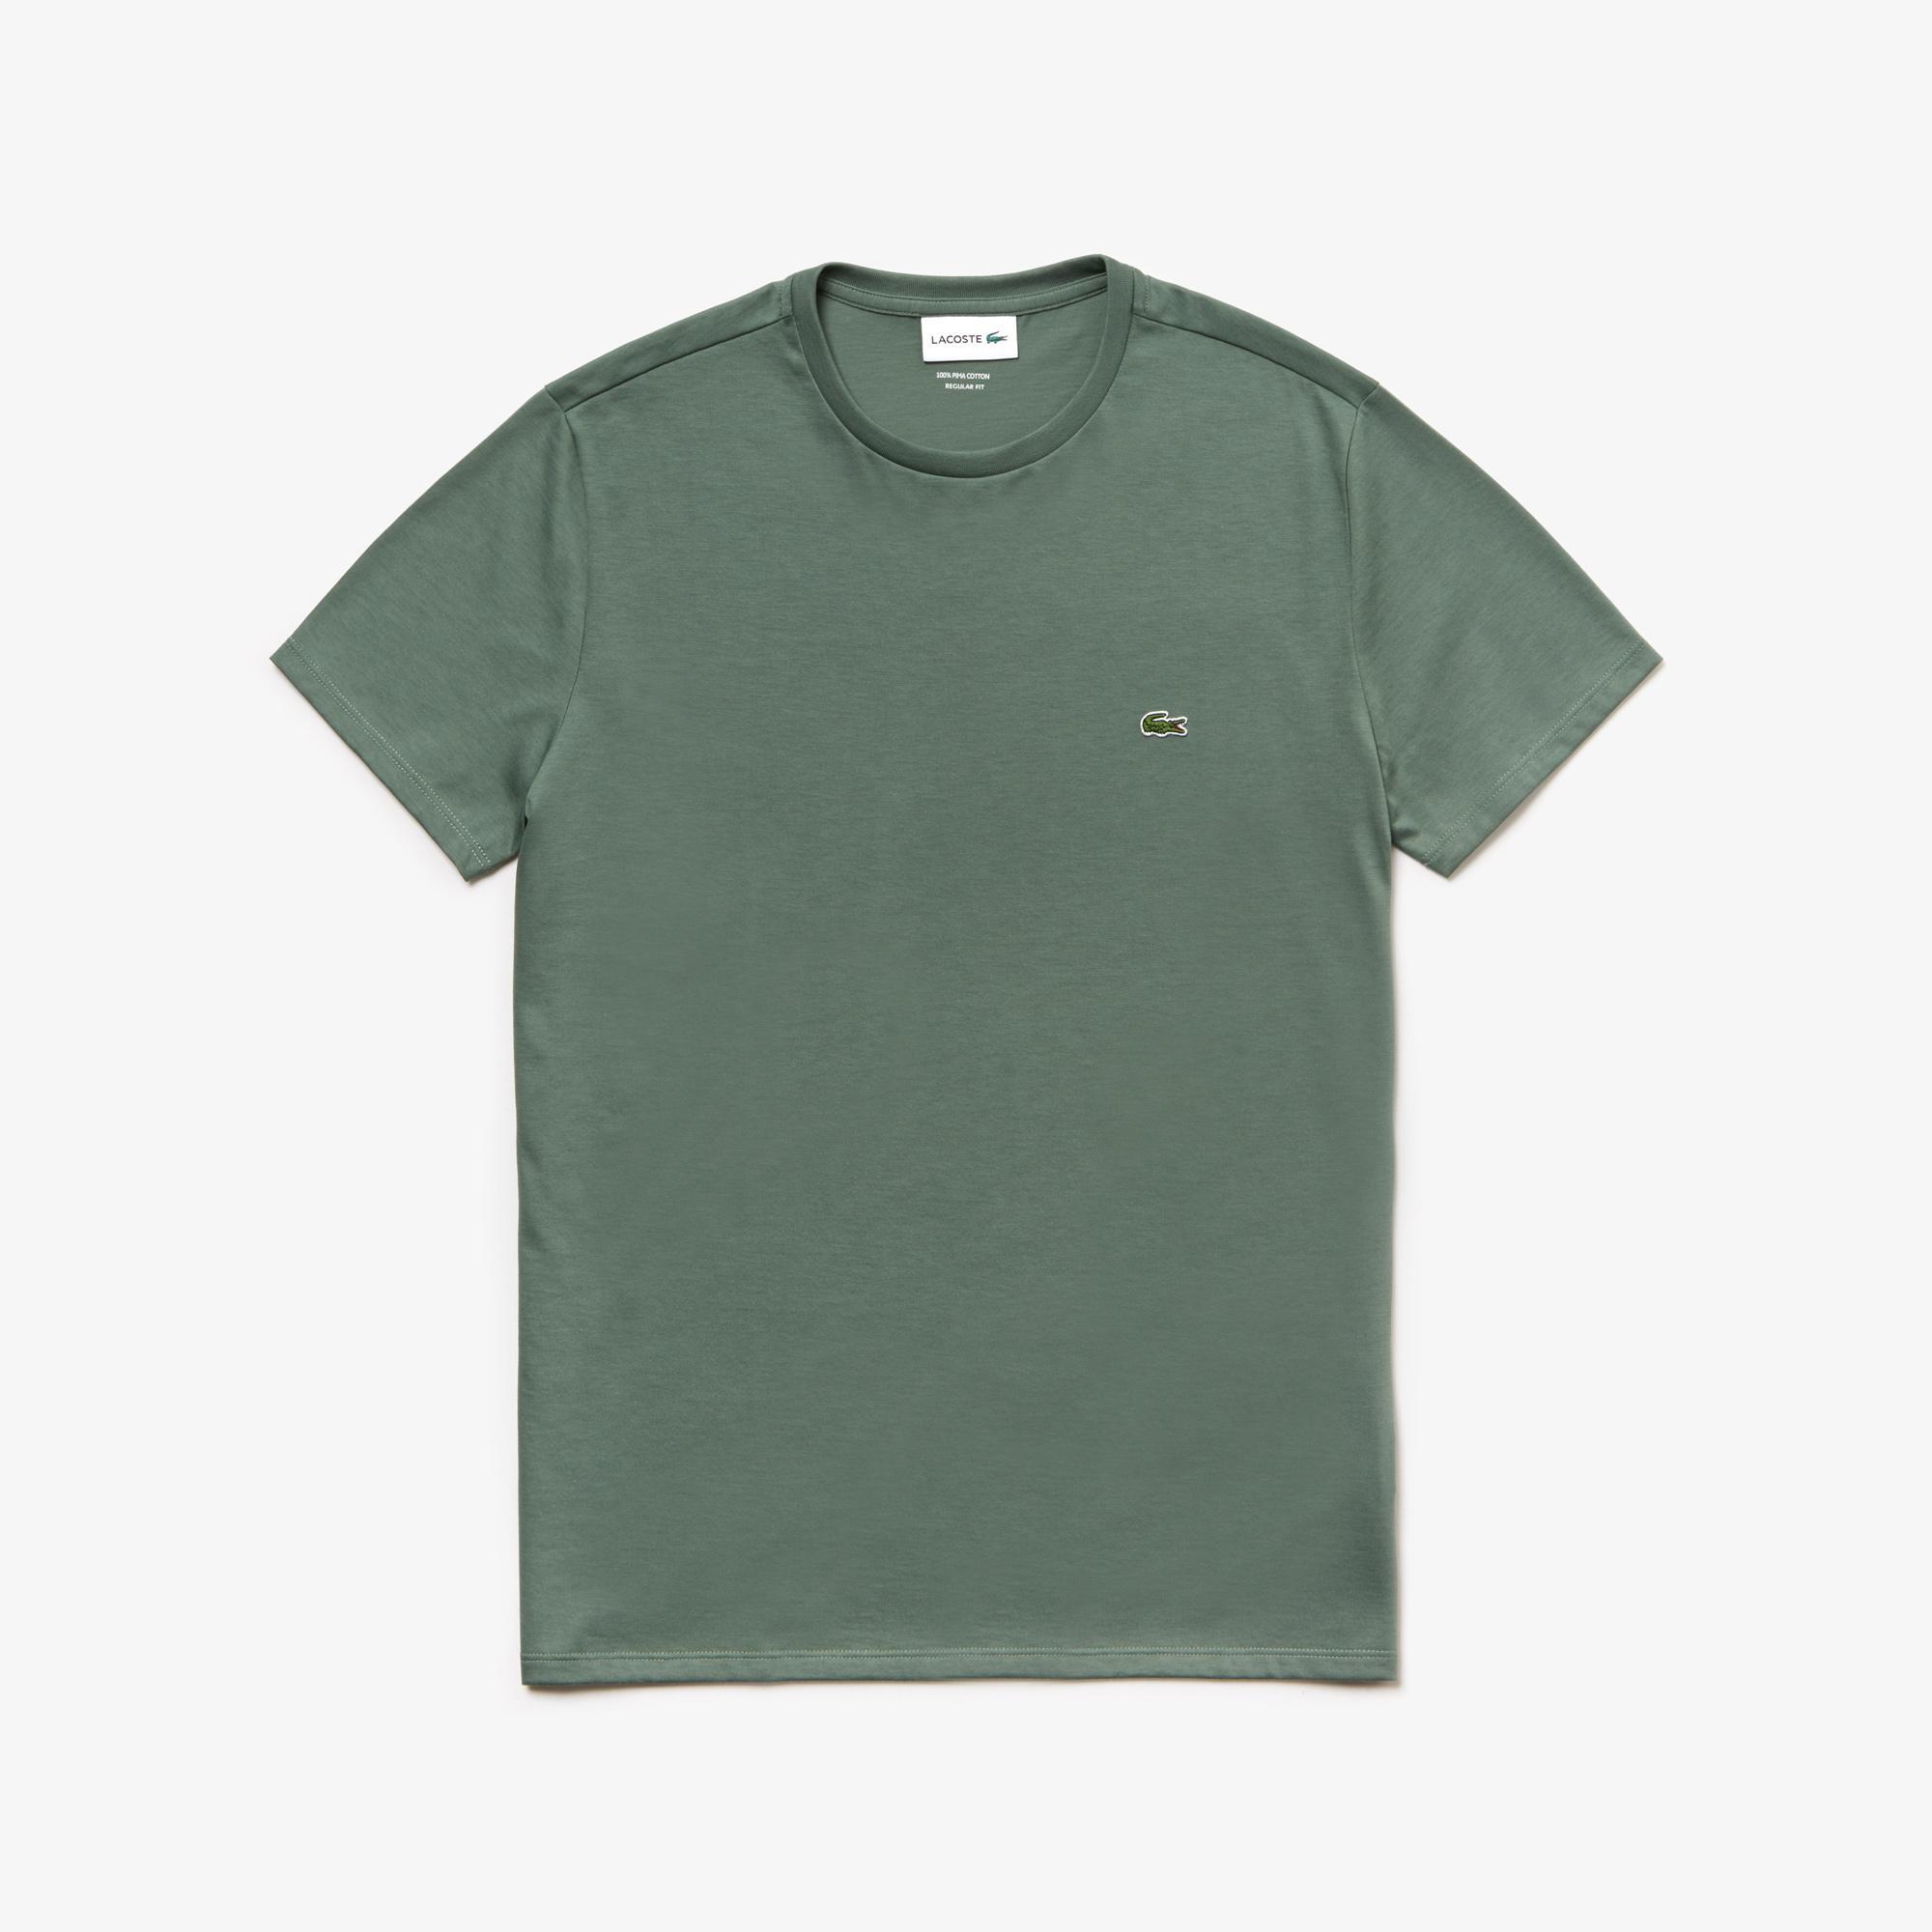 Lacoste Erkek Haki T-Shirt